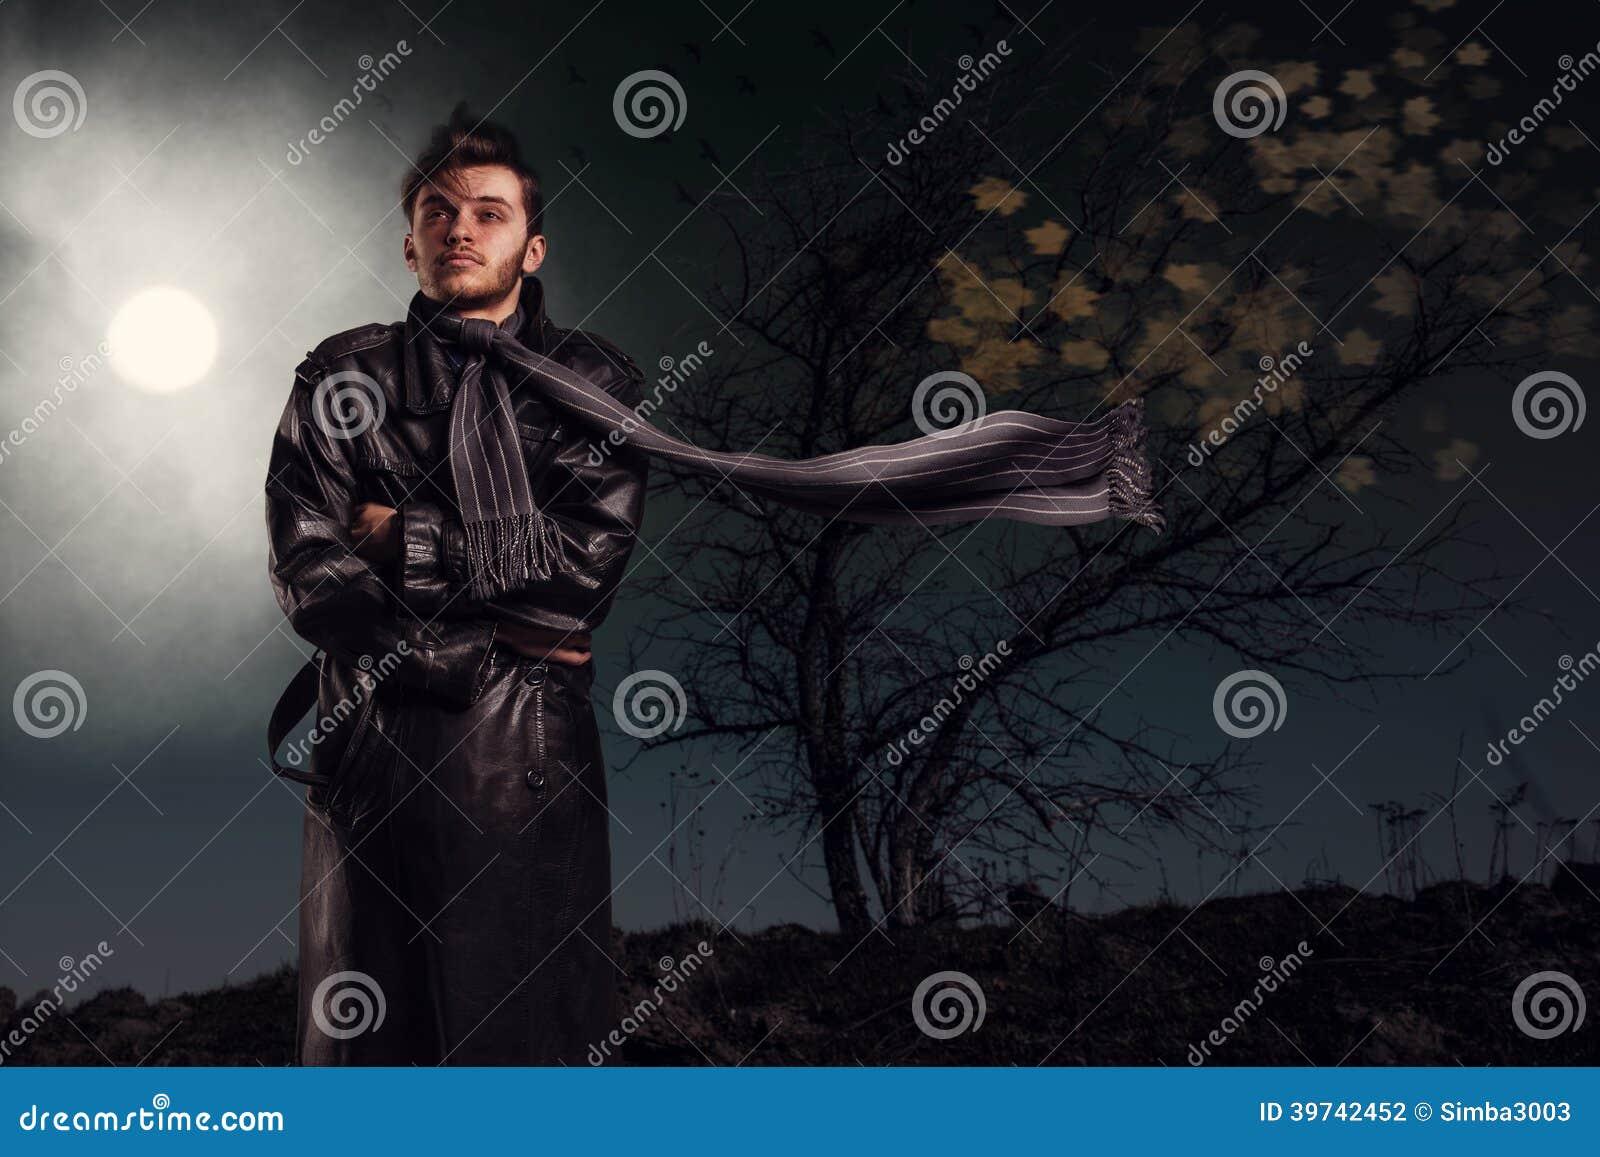 No fear leather jacket